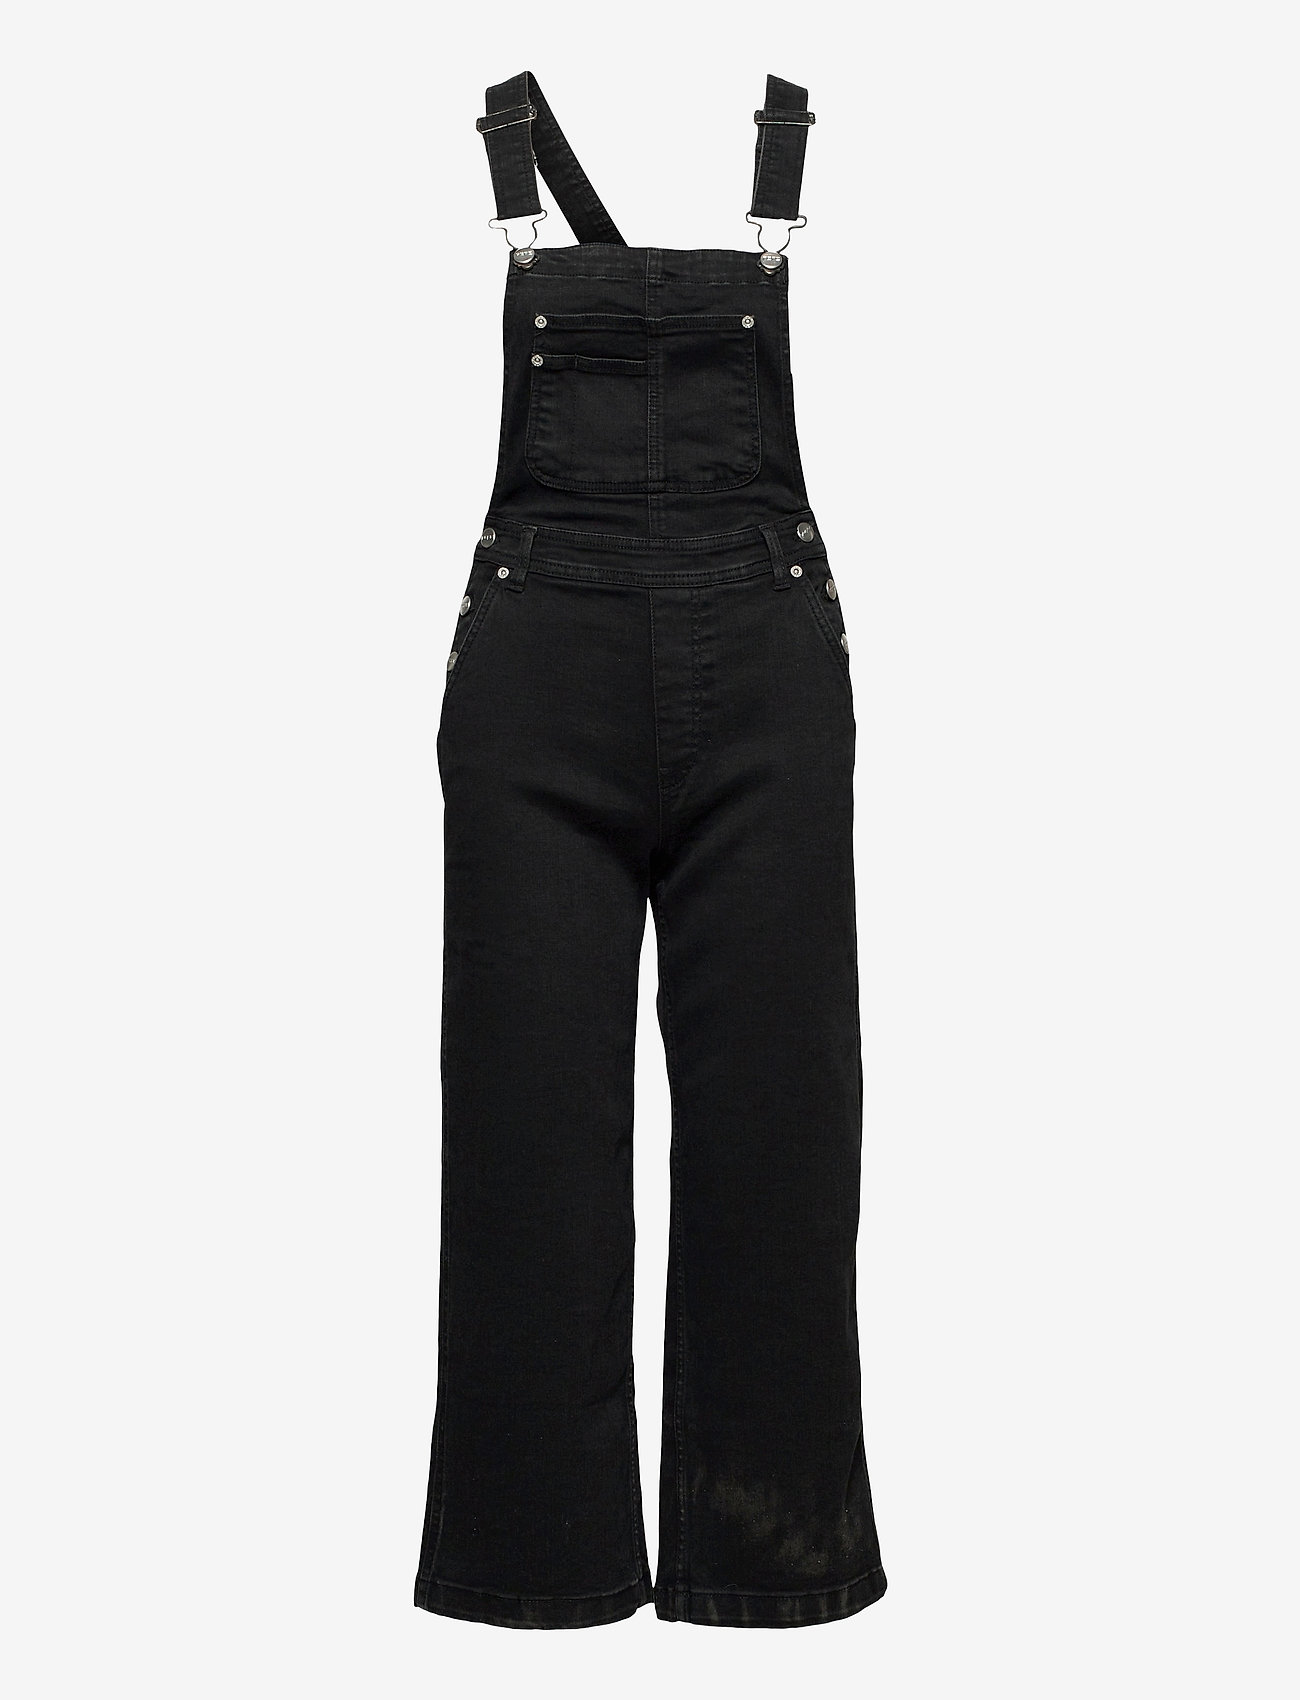 Pepe Jeans London - SHAY - jumpsuits - denim - 0